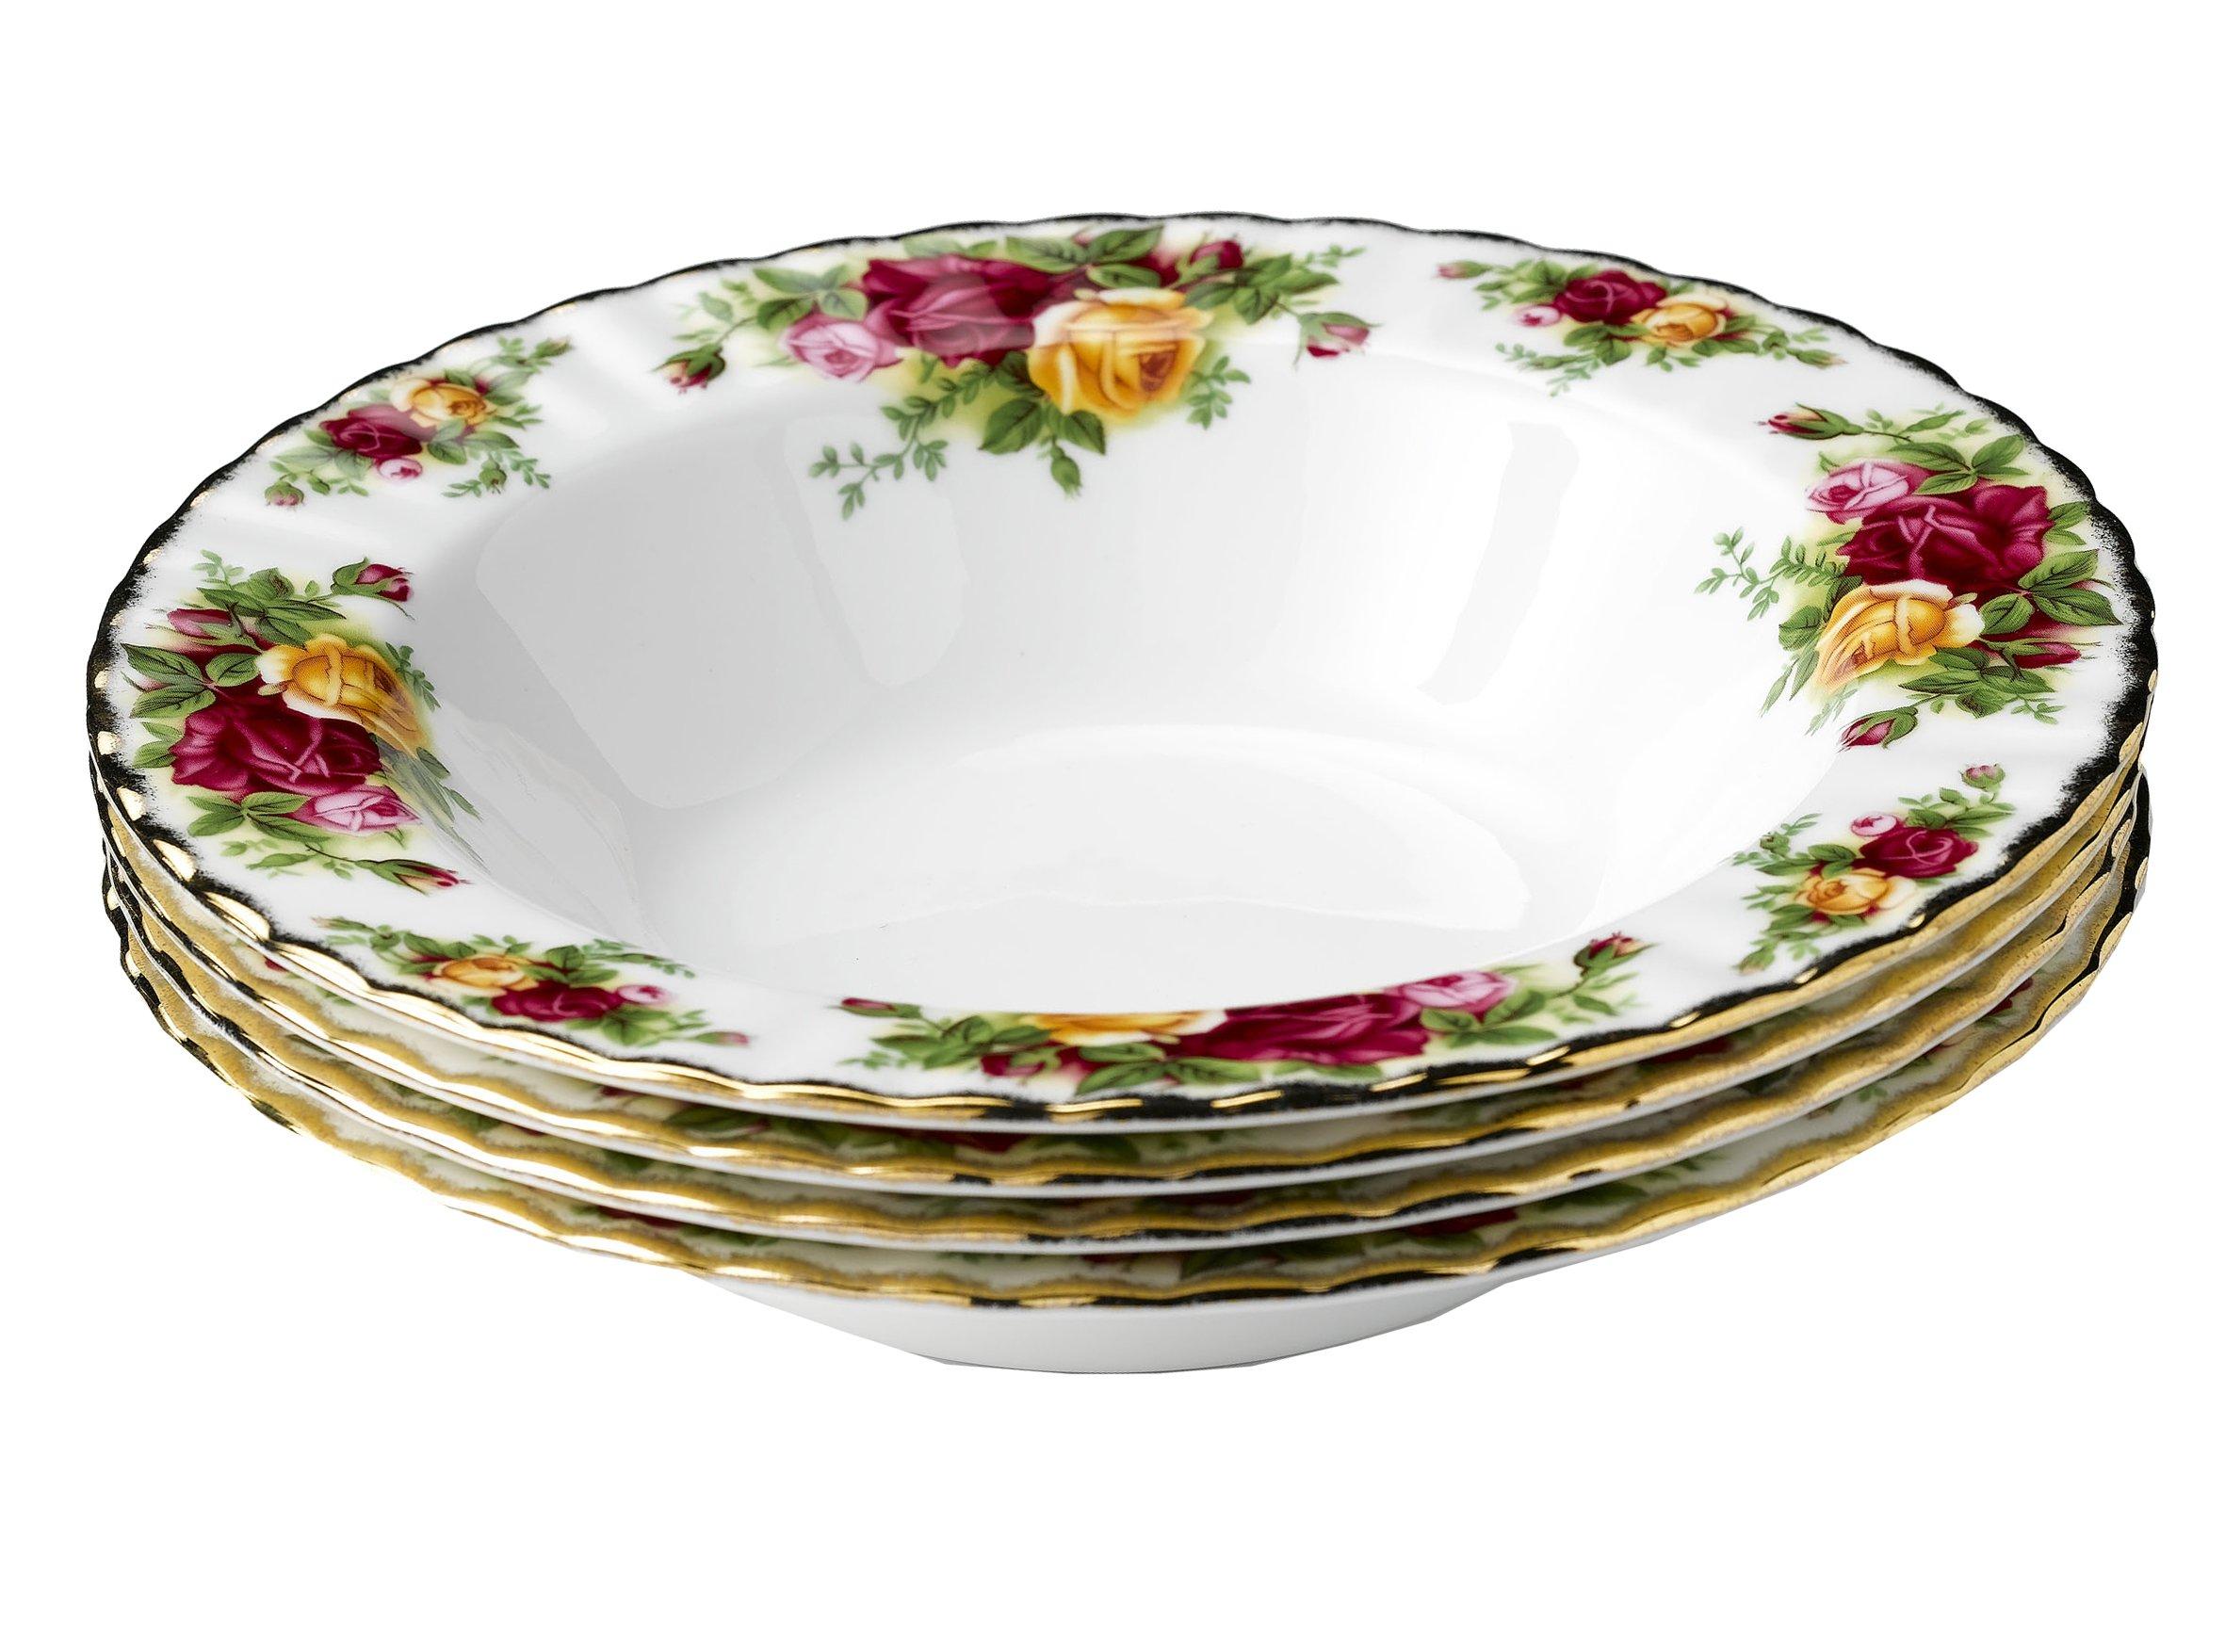 Royal Doulton-Royal Albert Old Country Roses Rim Soups, Set of 4